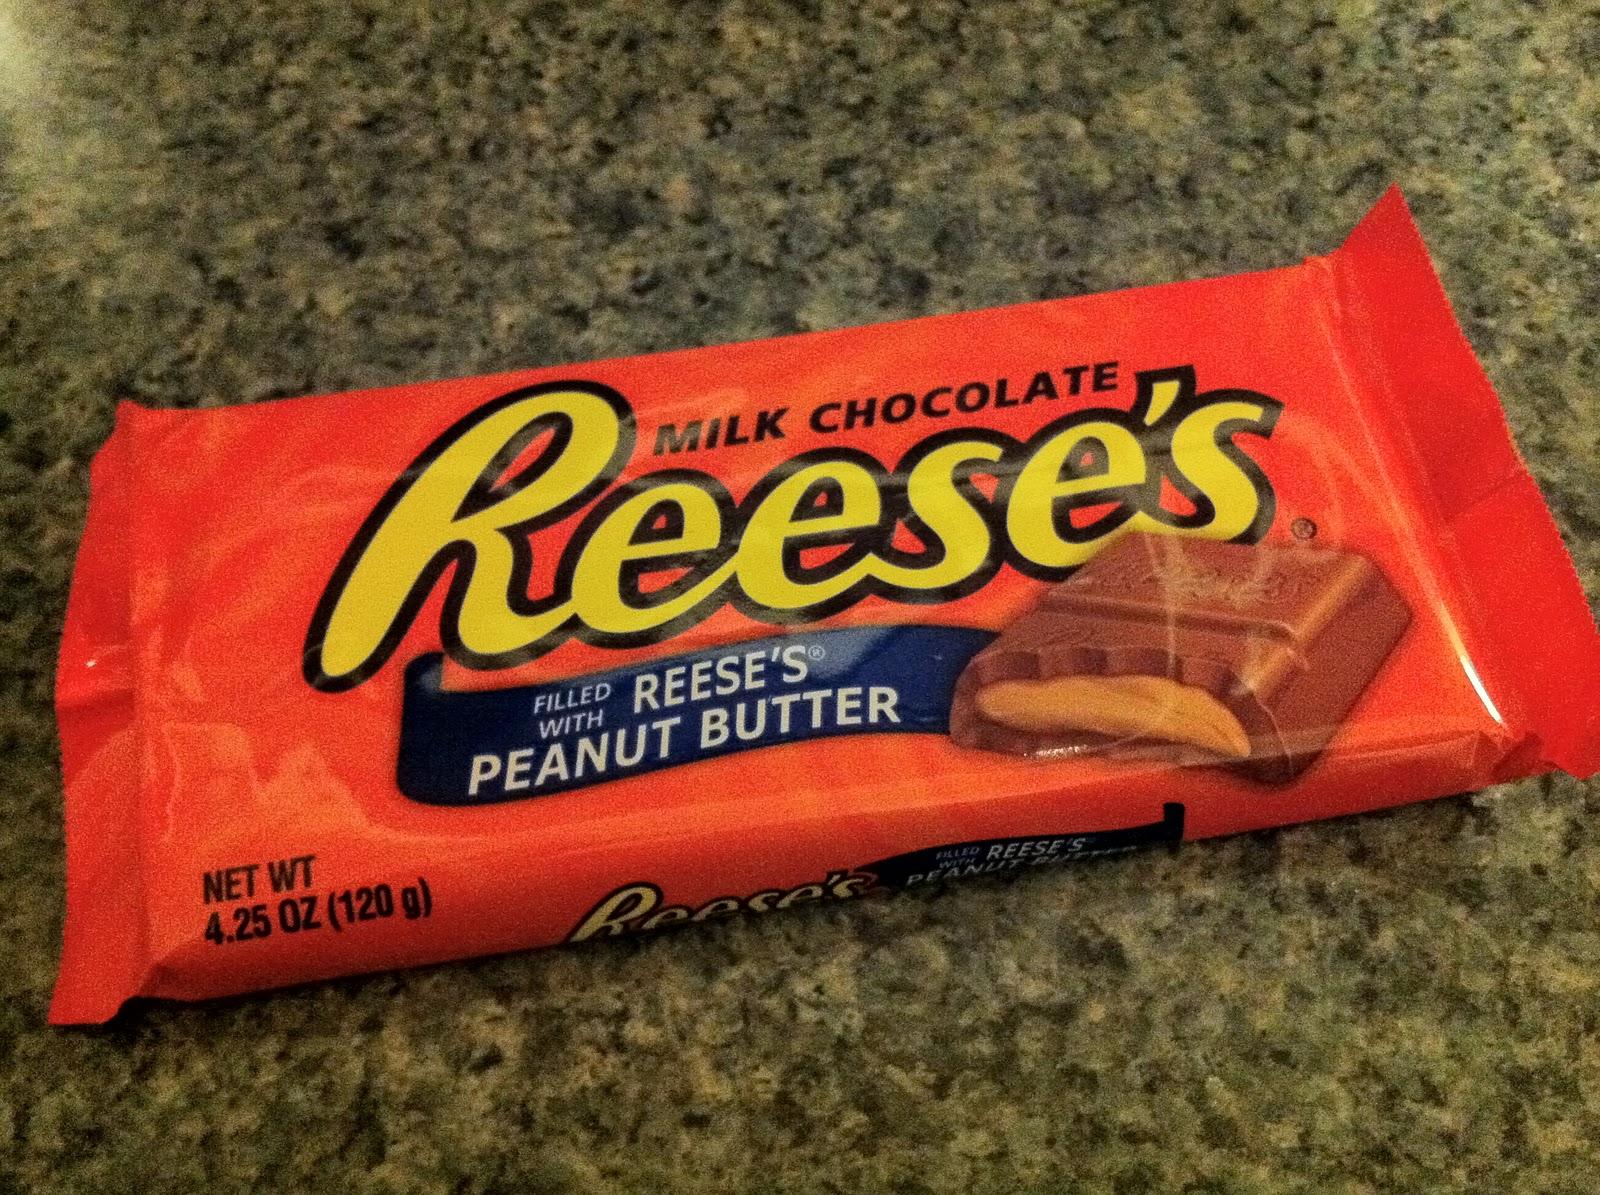 FATGUYFOODBLOG: The Reeses...chocolate bar?